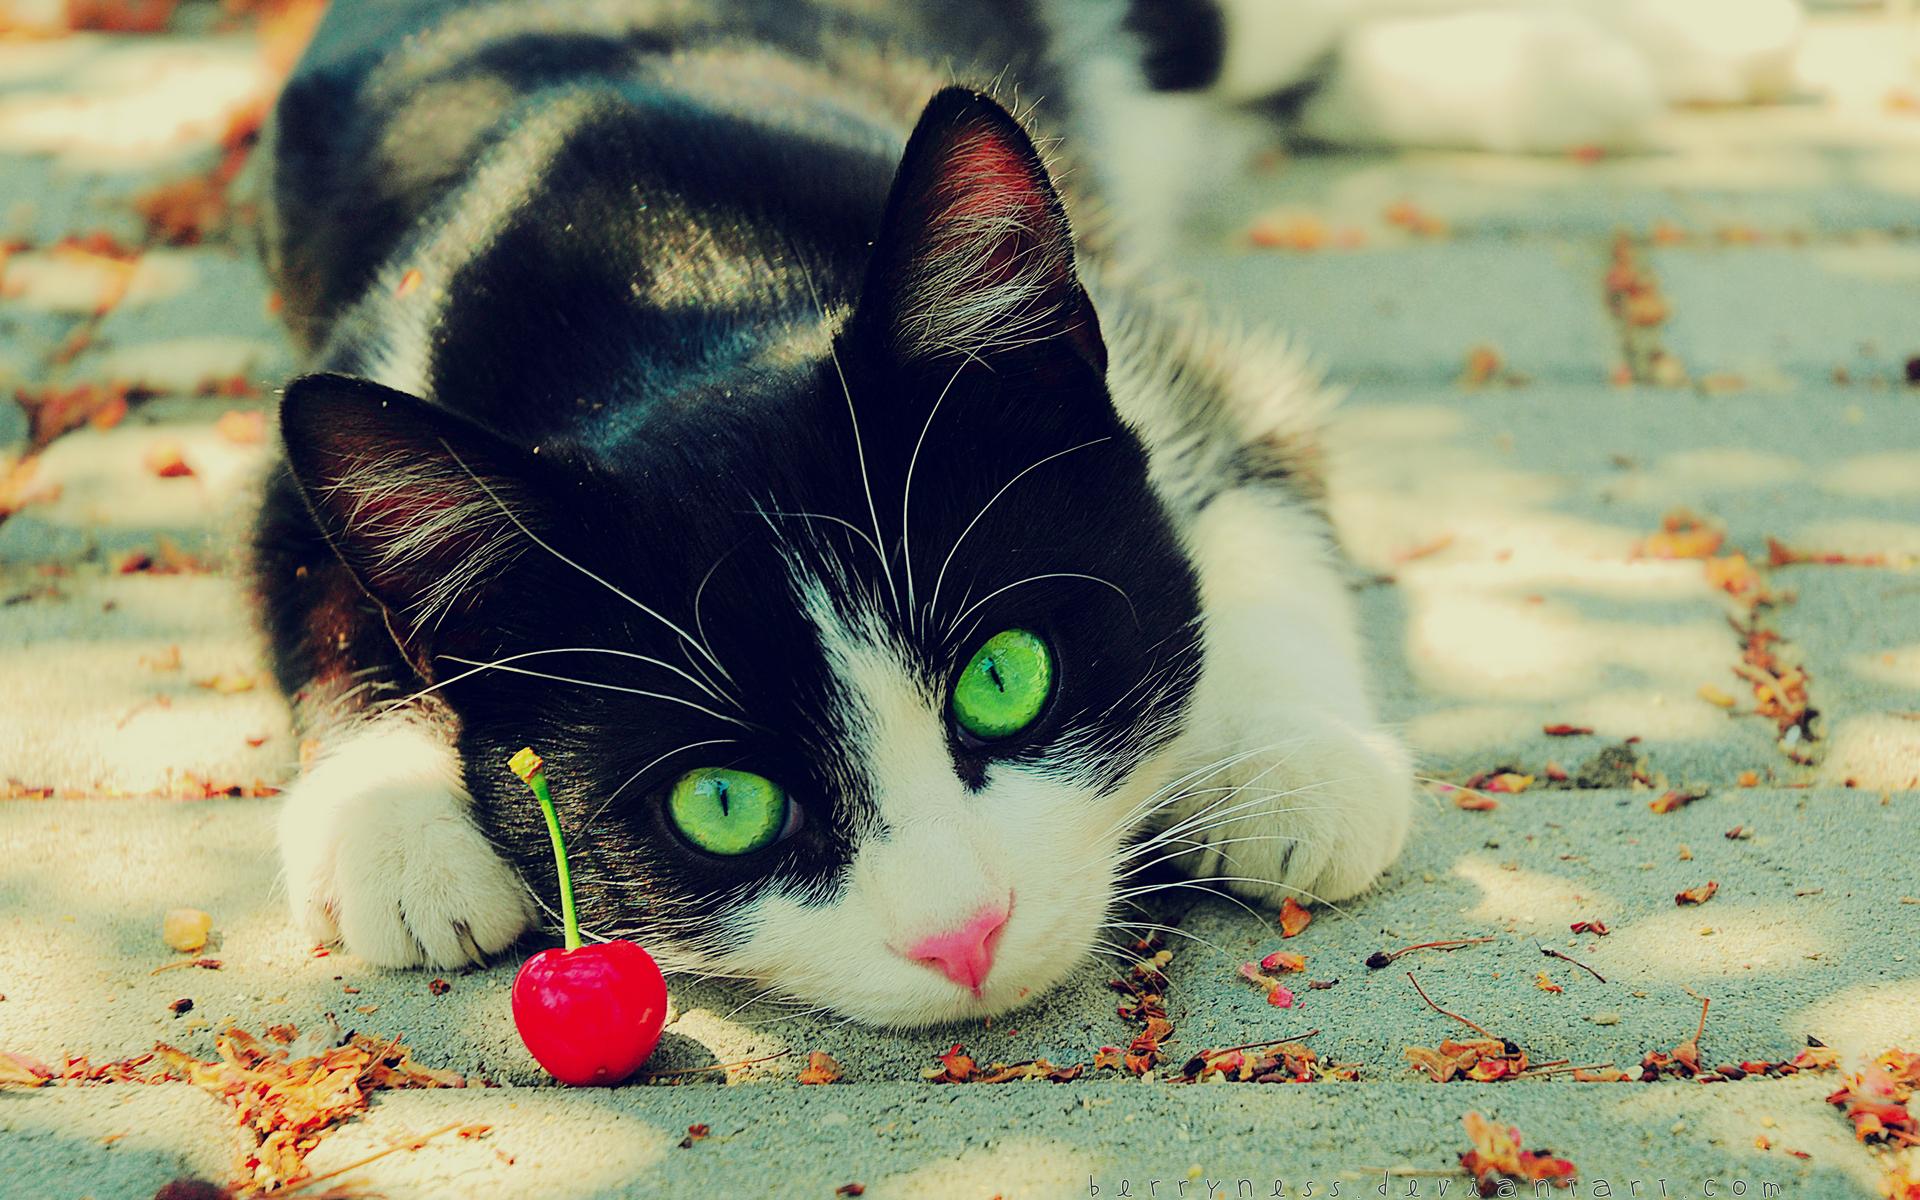 Nature_cats_animals_cherries_green_eyes_feline_pets_1920x1200.jpg